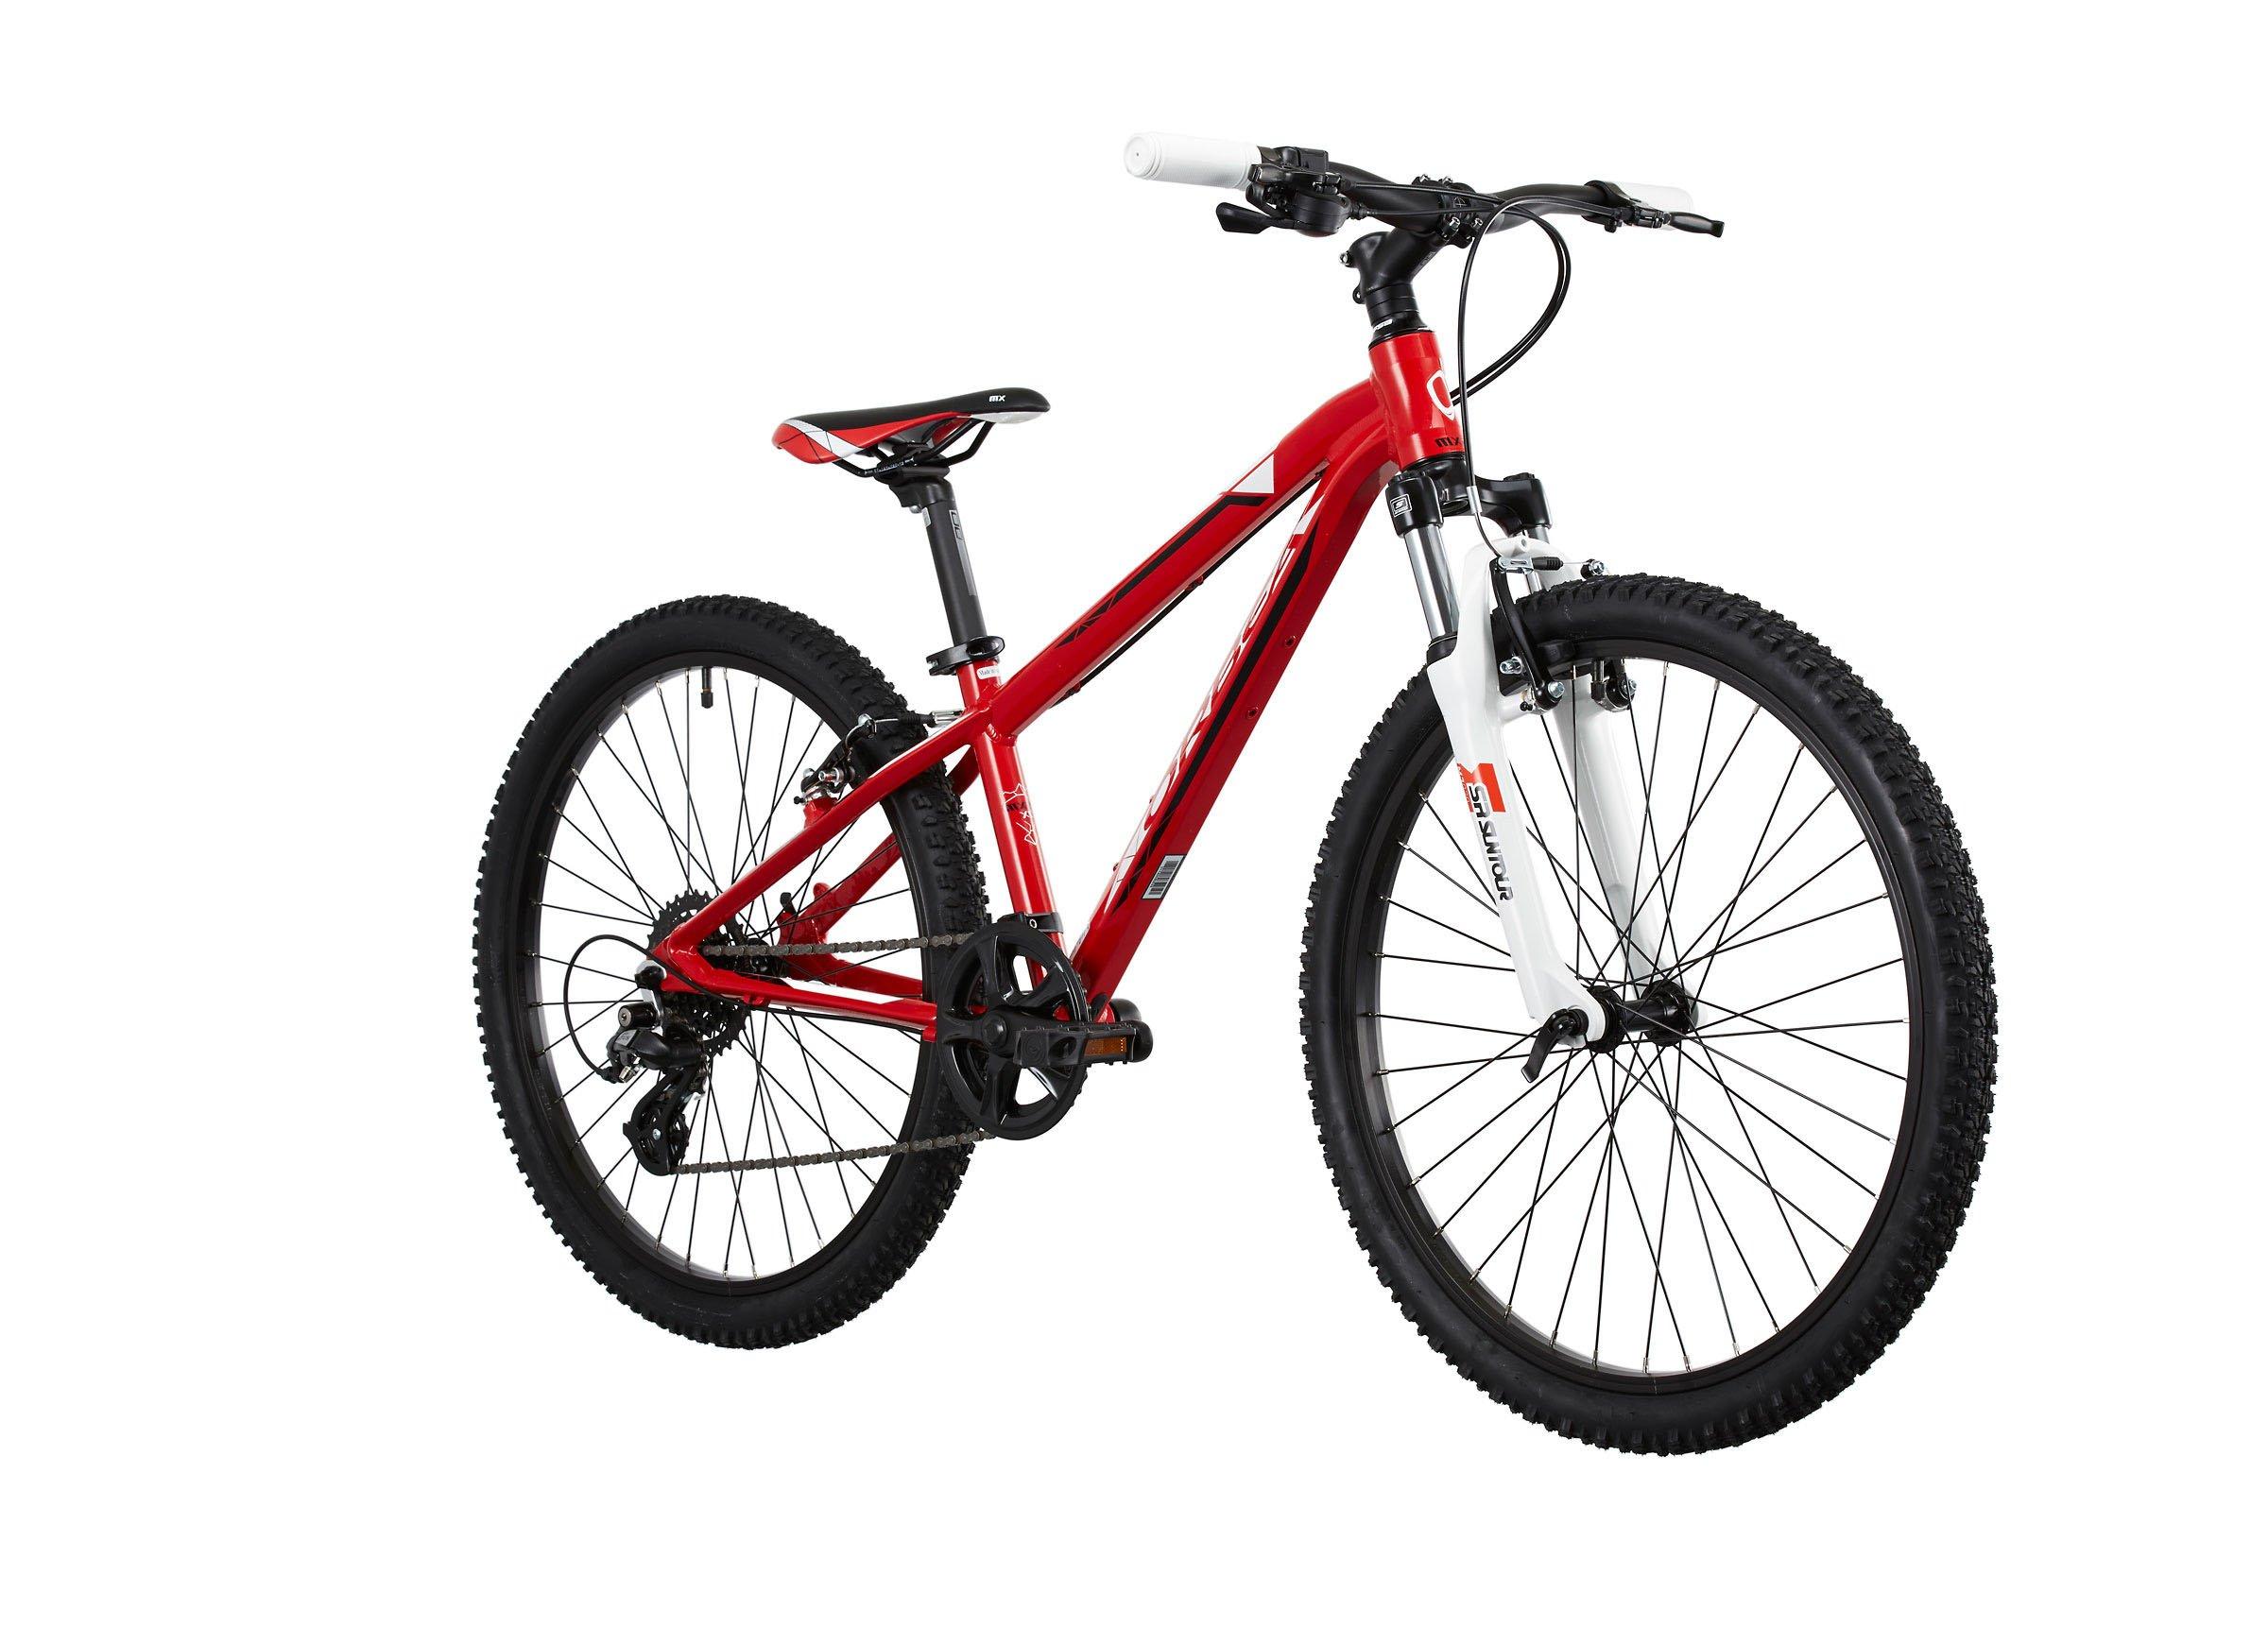 Bicicleta para niños ORBEA MX 24 XC rojo 2015: Amazon.es: Deportes ...